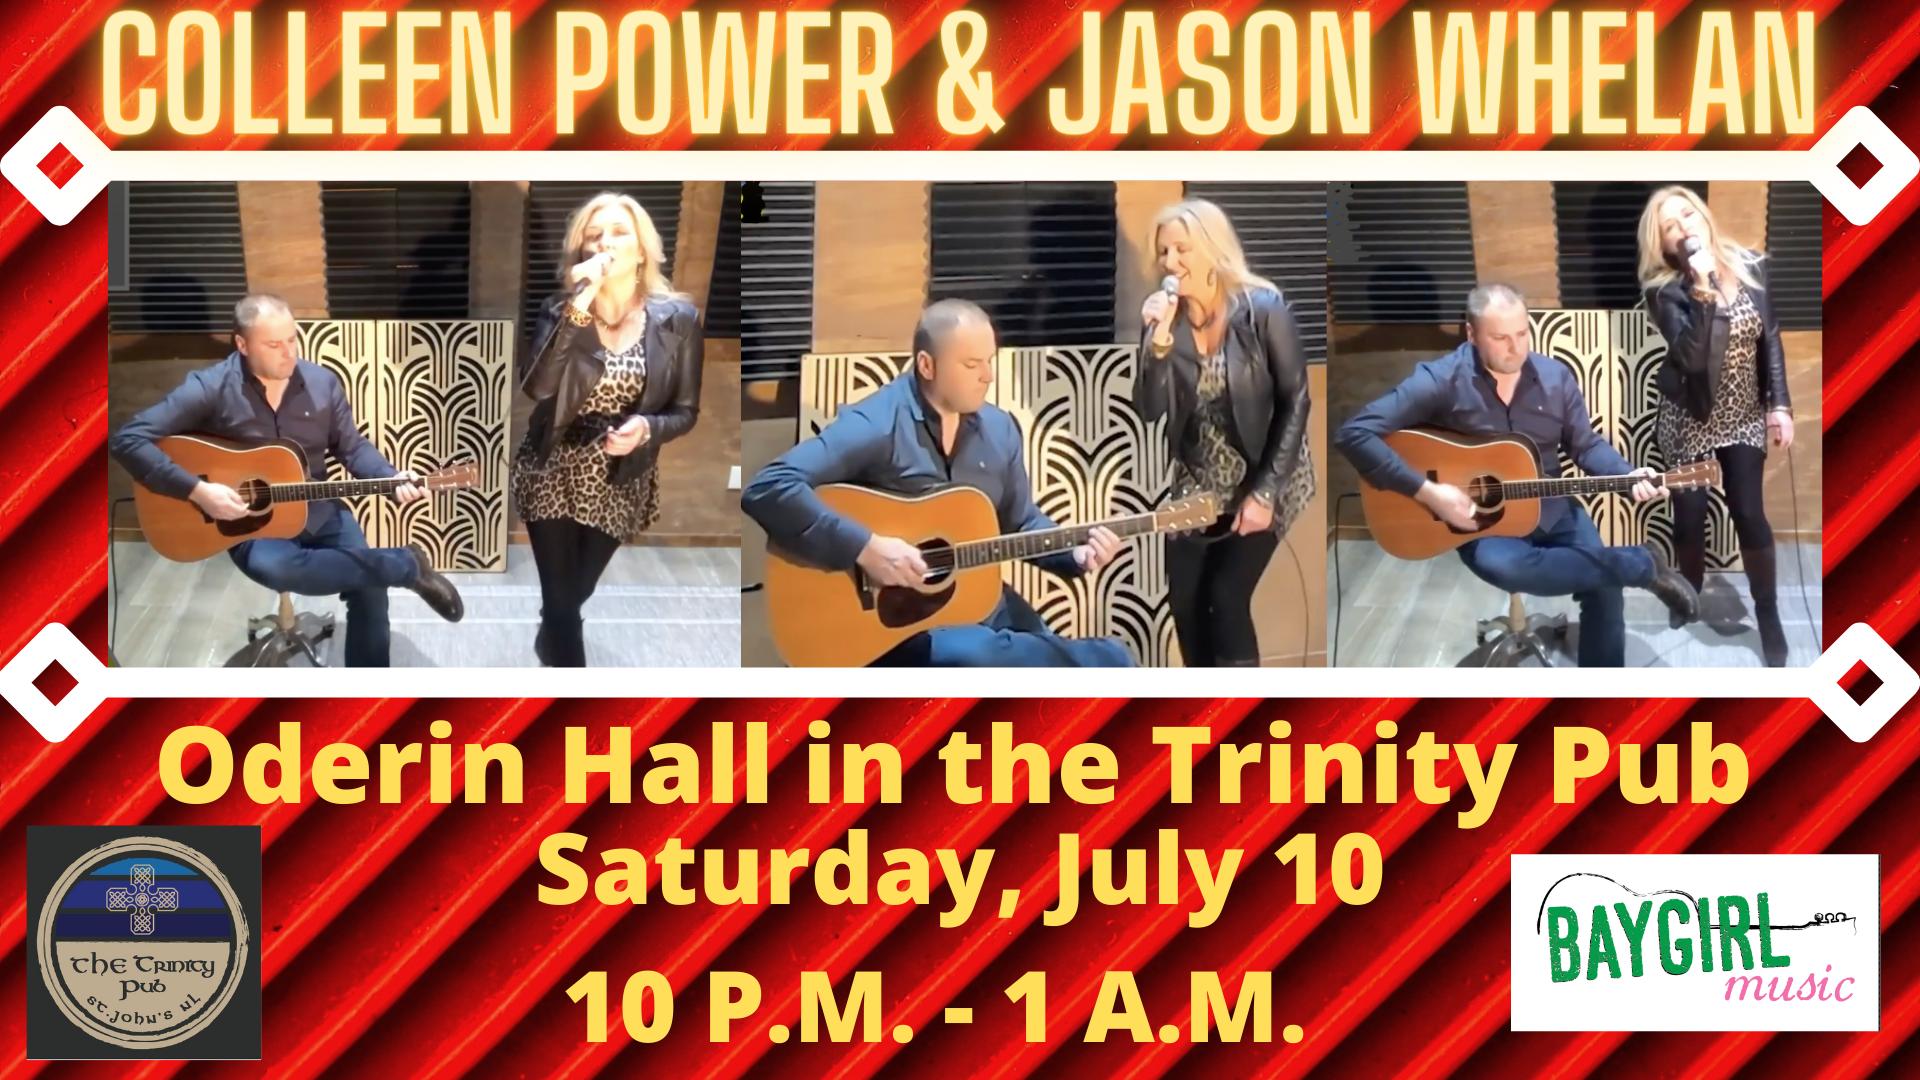 Colleen Power & Jason Whelan